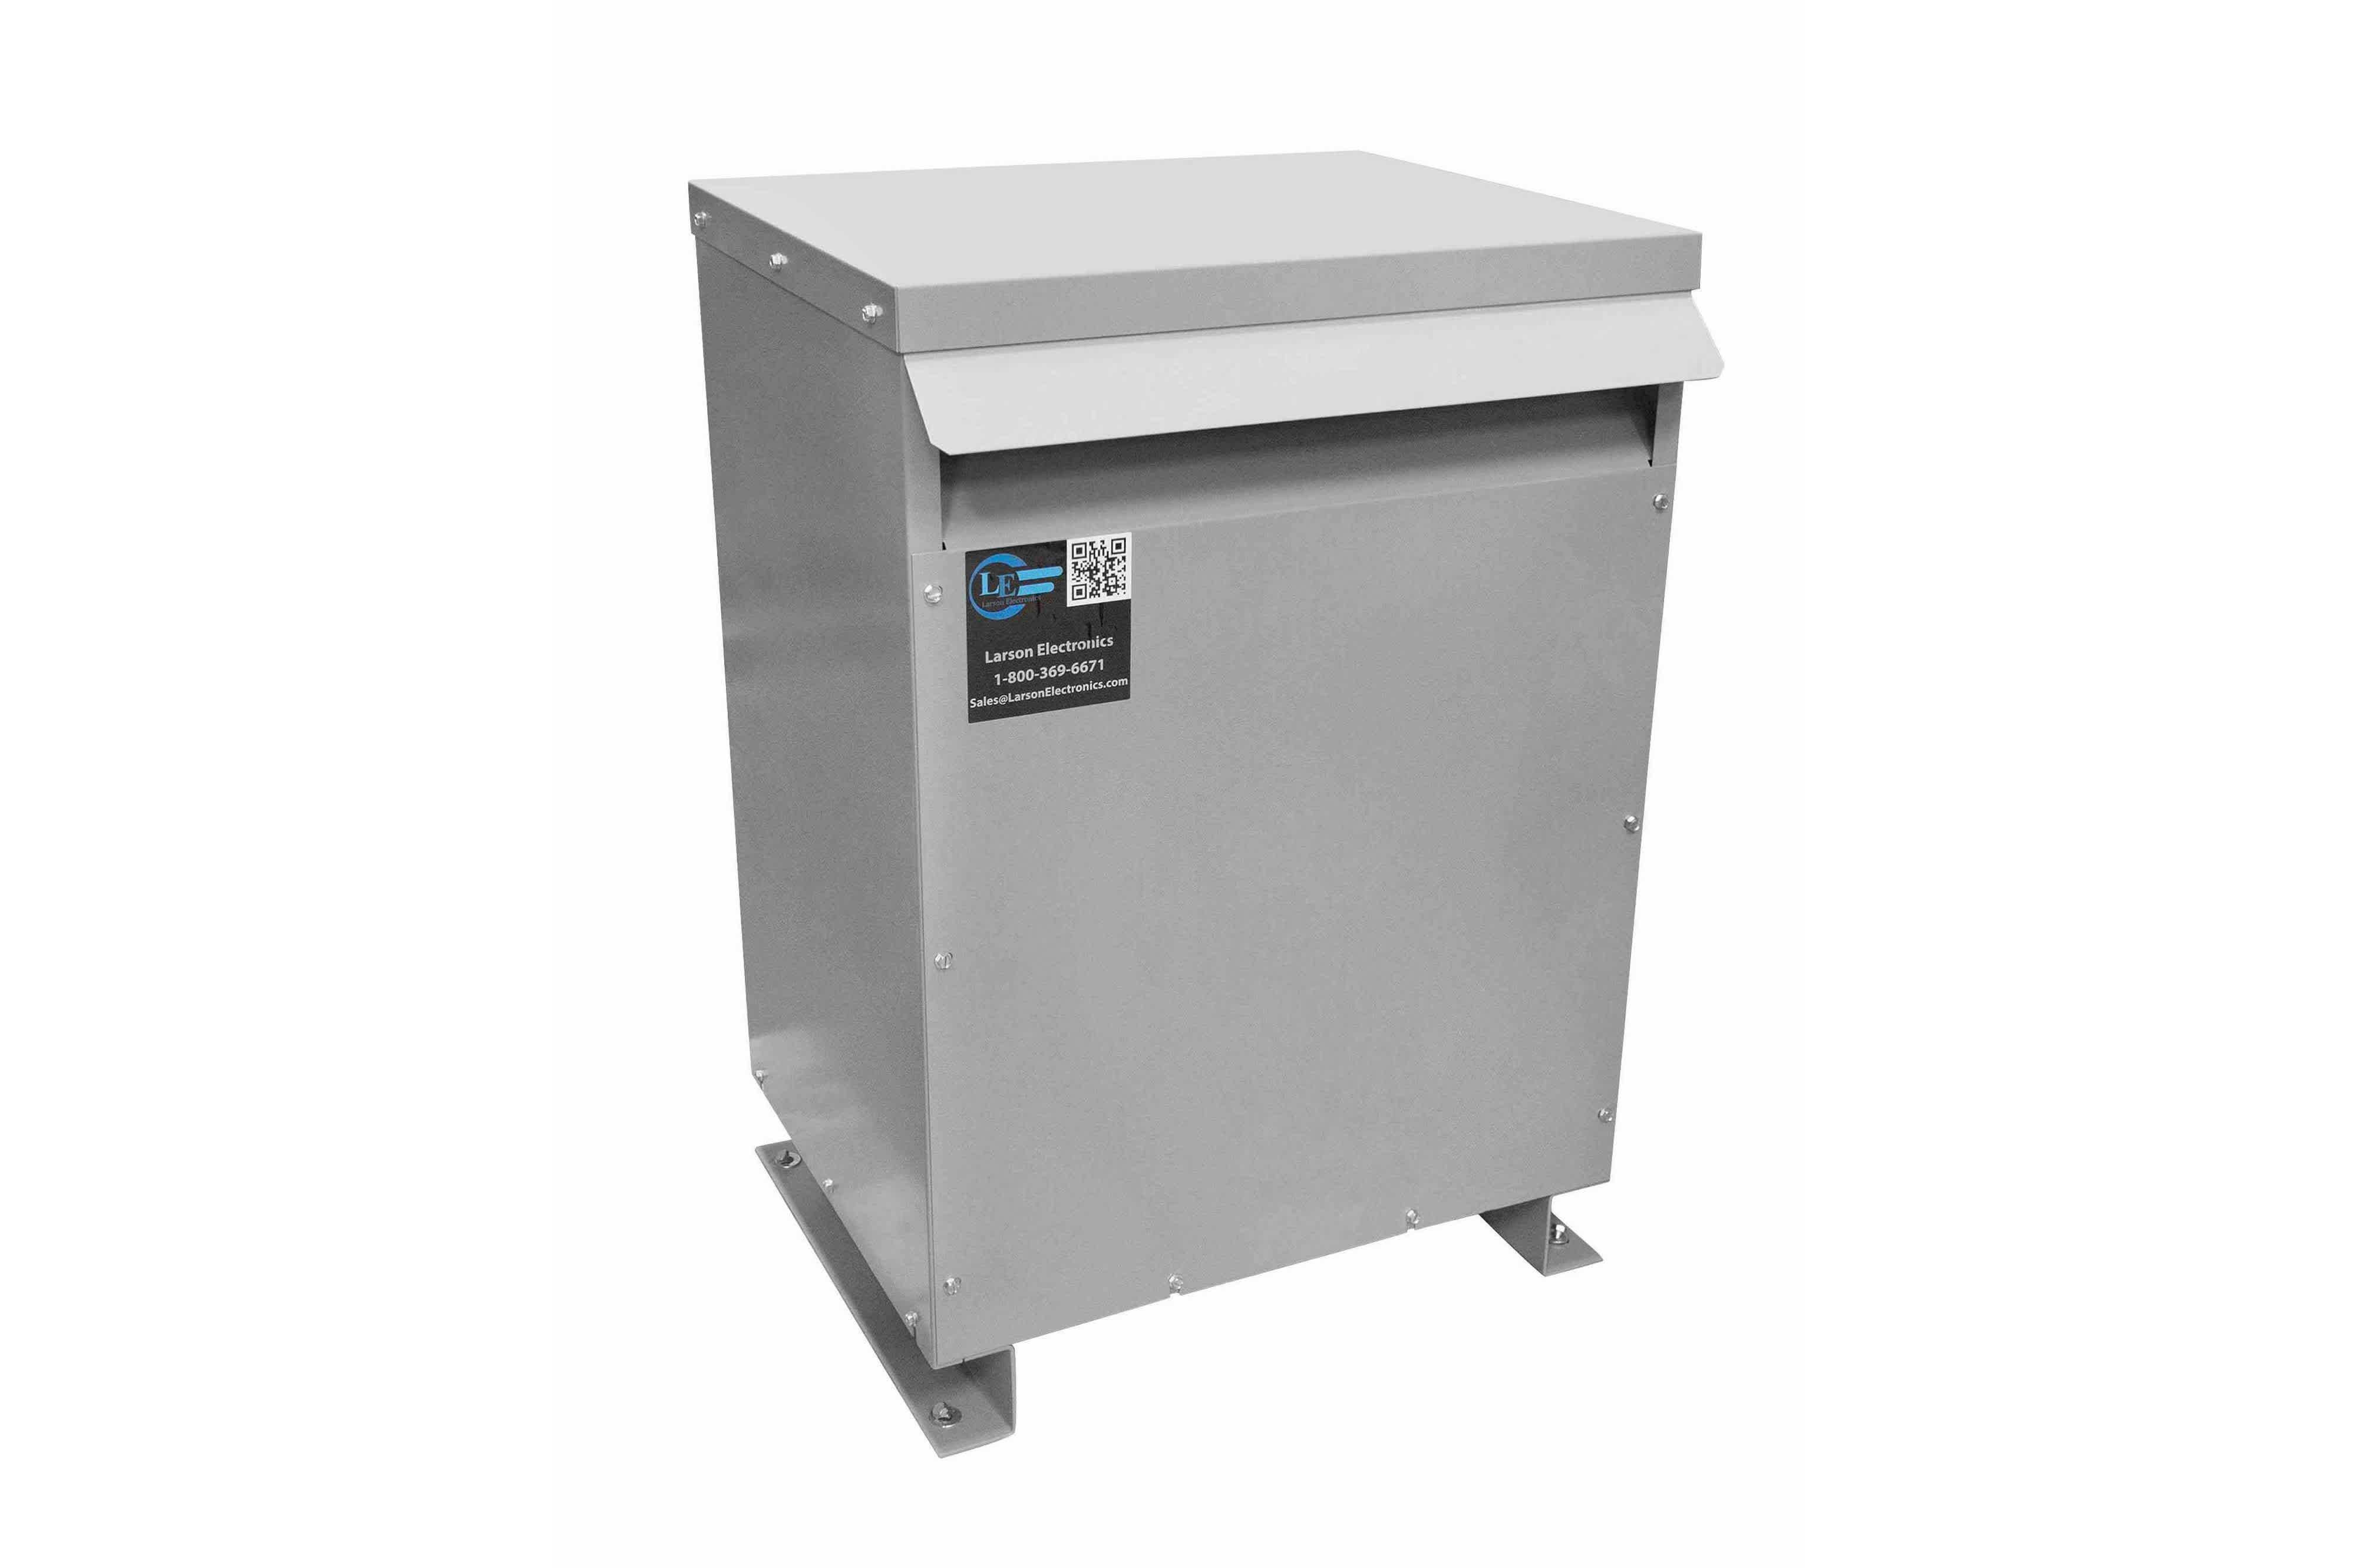 225 kVA 3PH Isolation Transformer, 575V Wye Primary, 208Y/120 Wye-N Secondary, N3R, Ventilated, 60 Hz